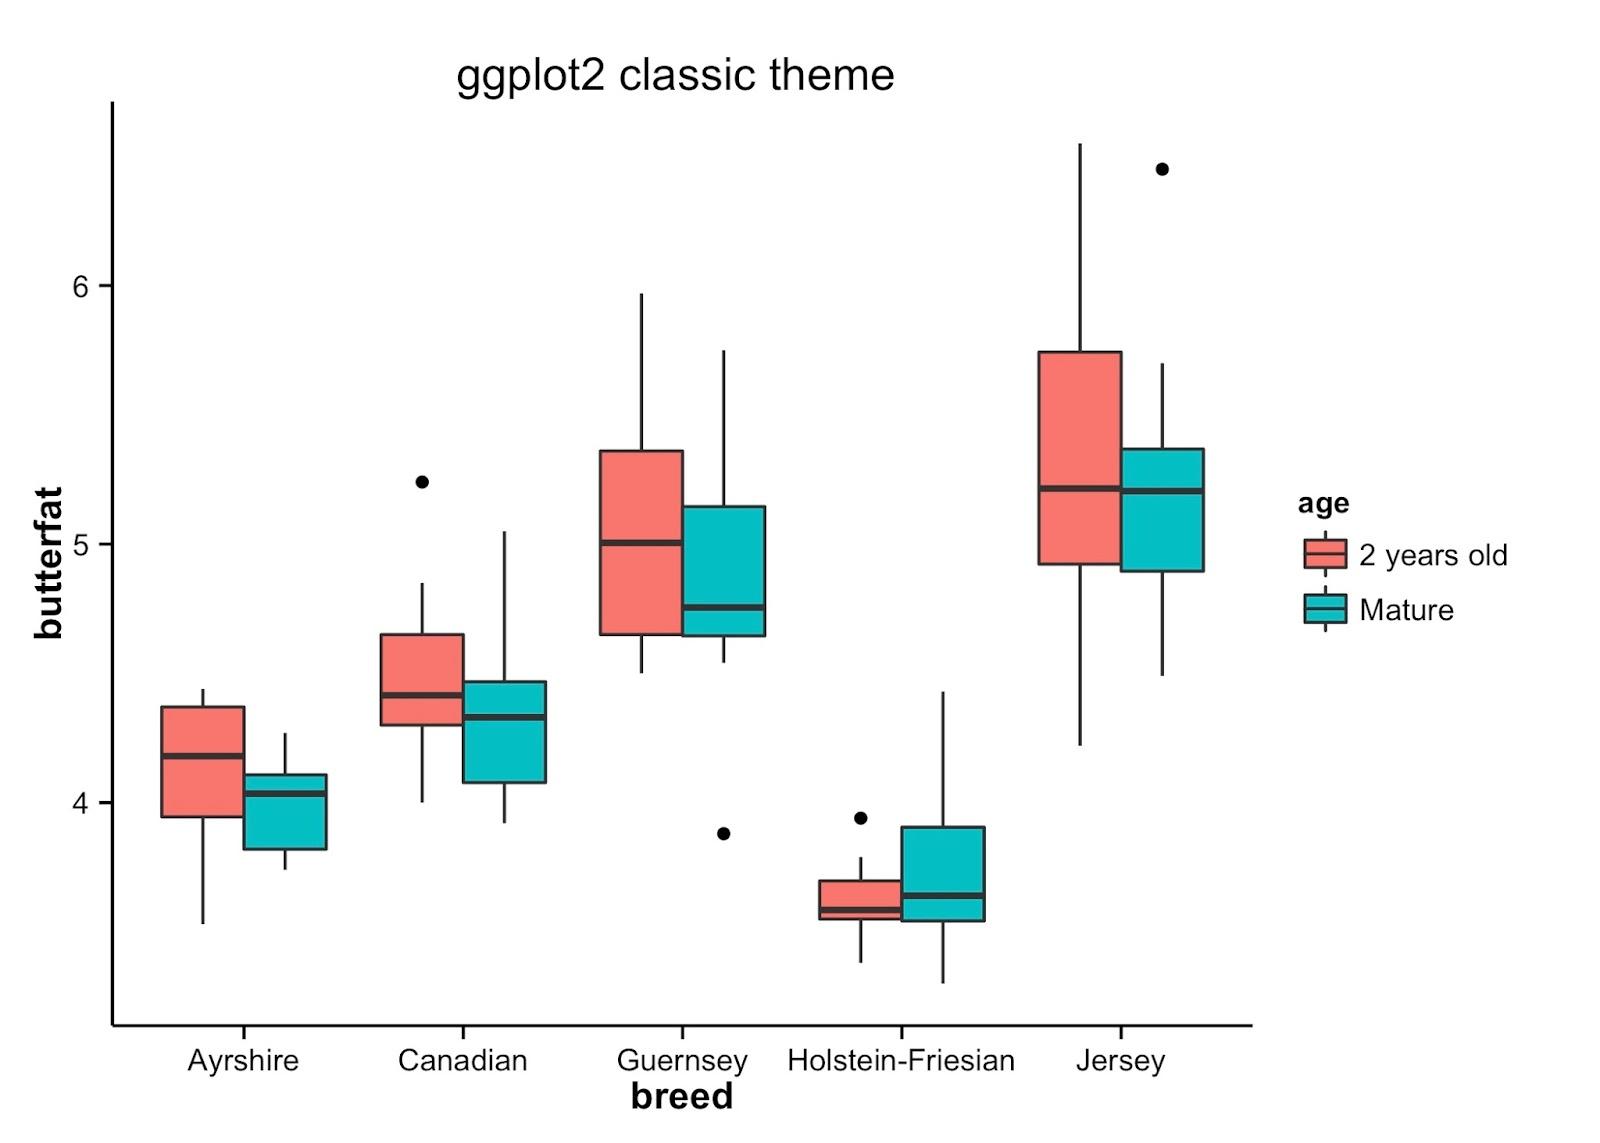 ggplot2 density